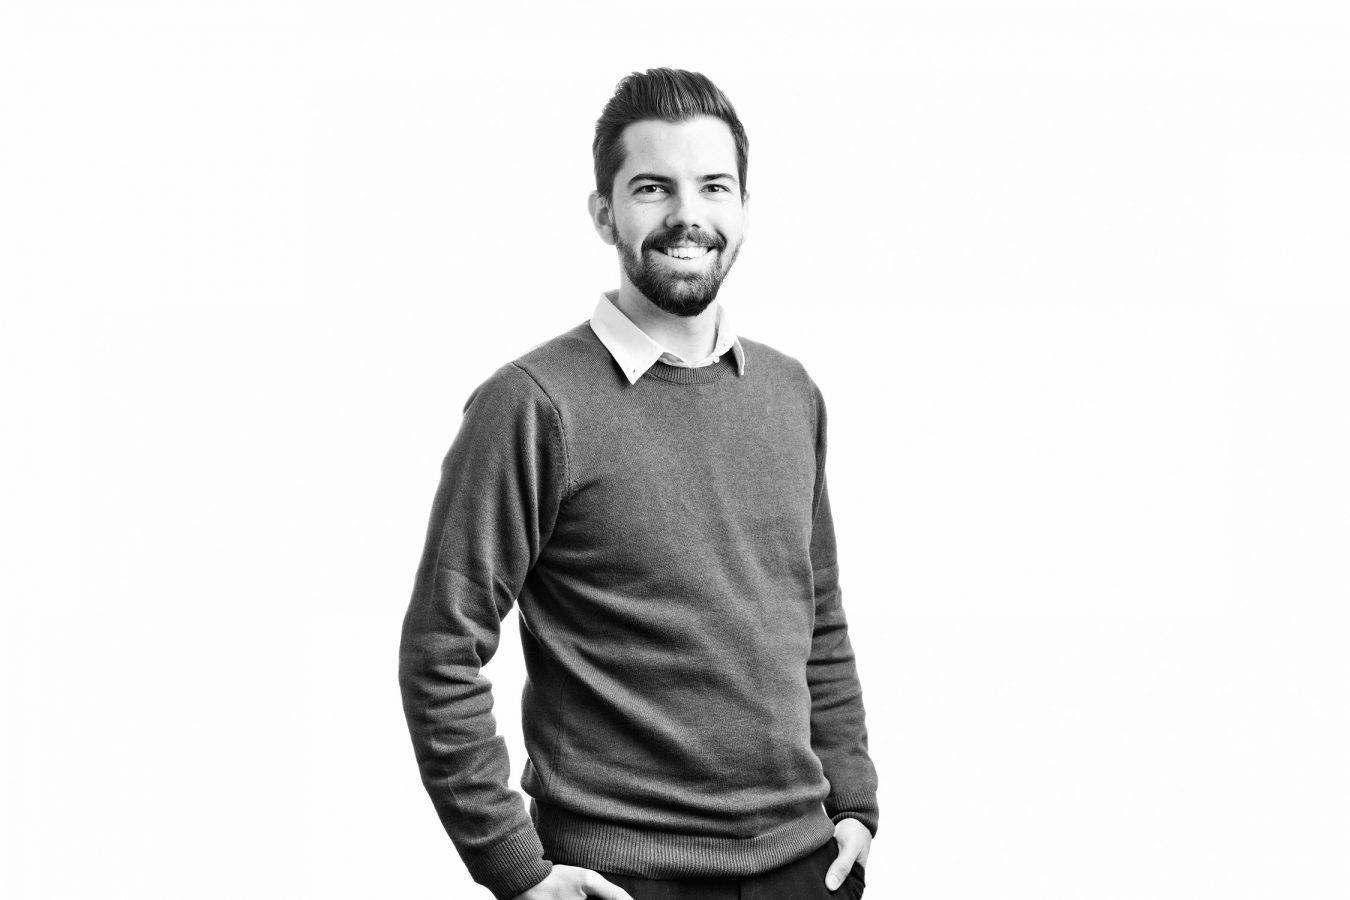 Taylor-Vinters-male-staff-portrait-studio-black-and-white-london